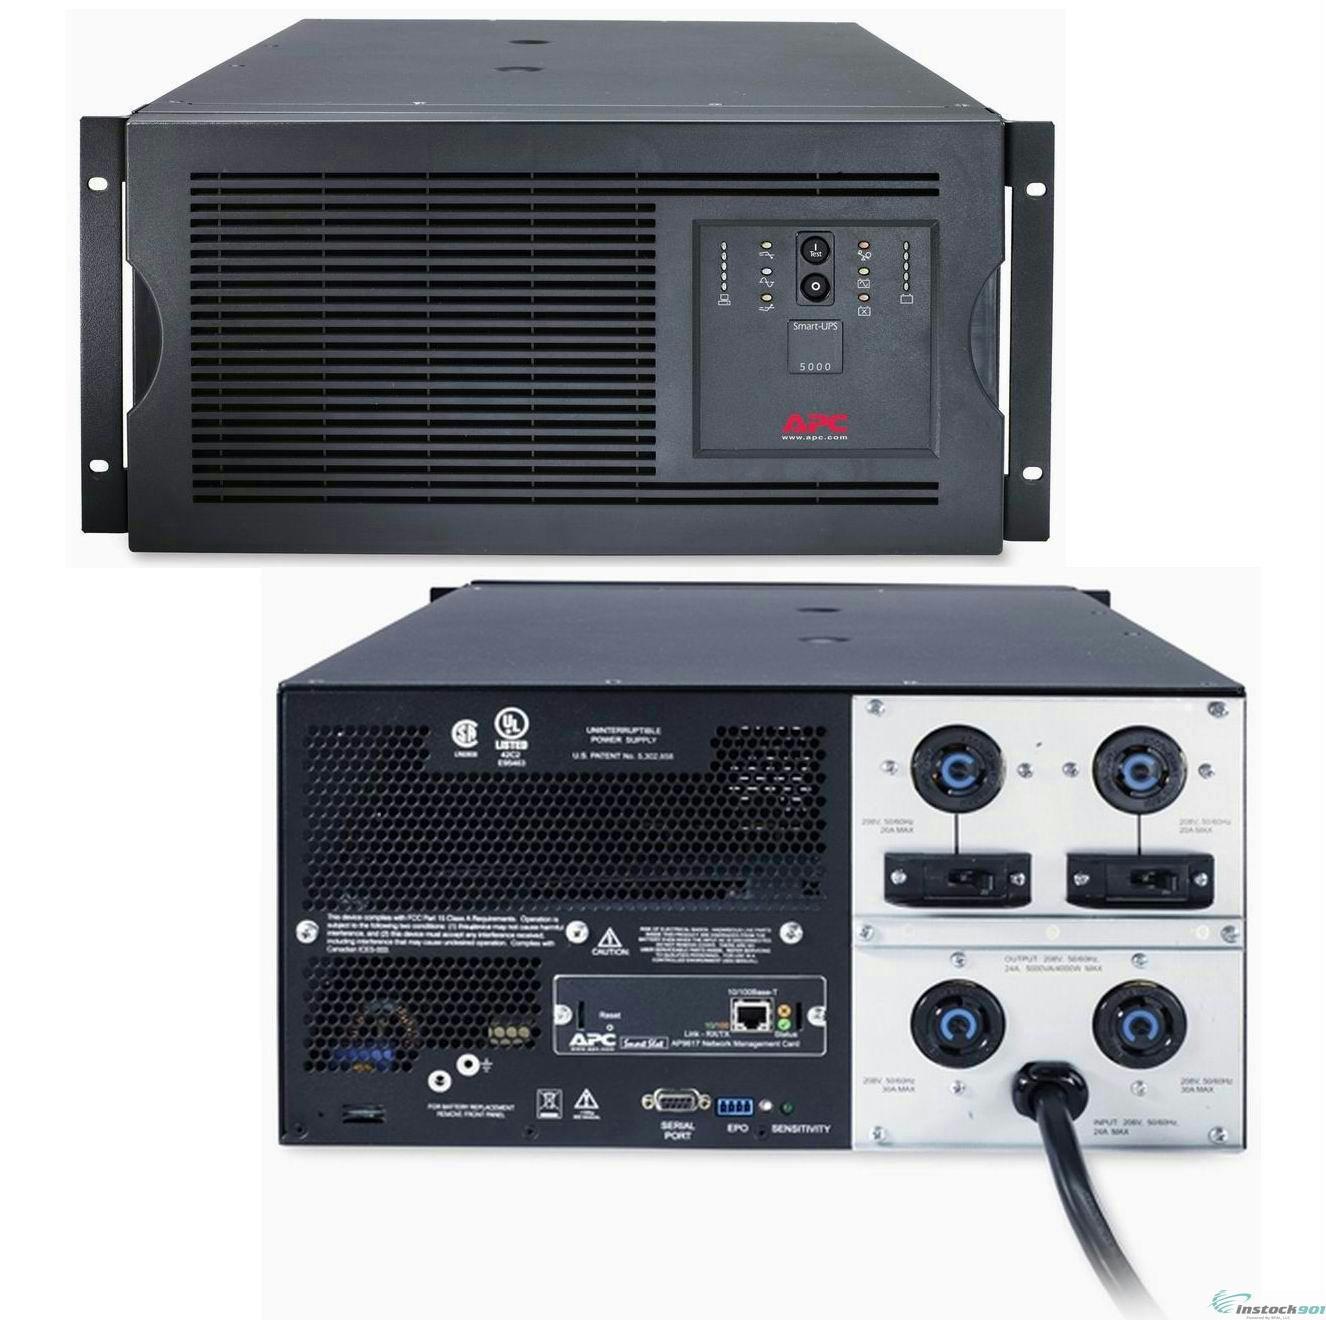 APC SUA5000RMT5U 5000VA 4000W 208V 5U RACK/TOWER SMART-UPS